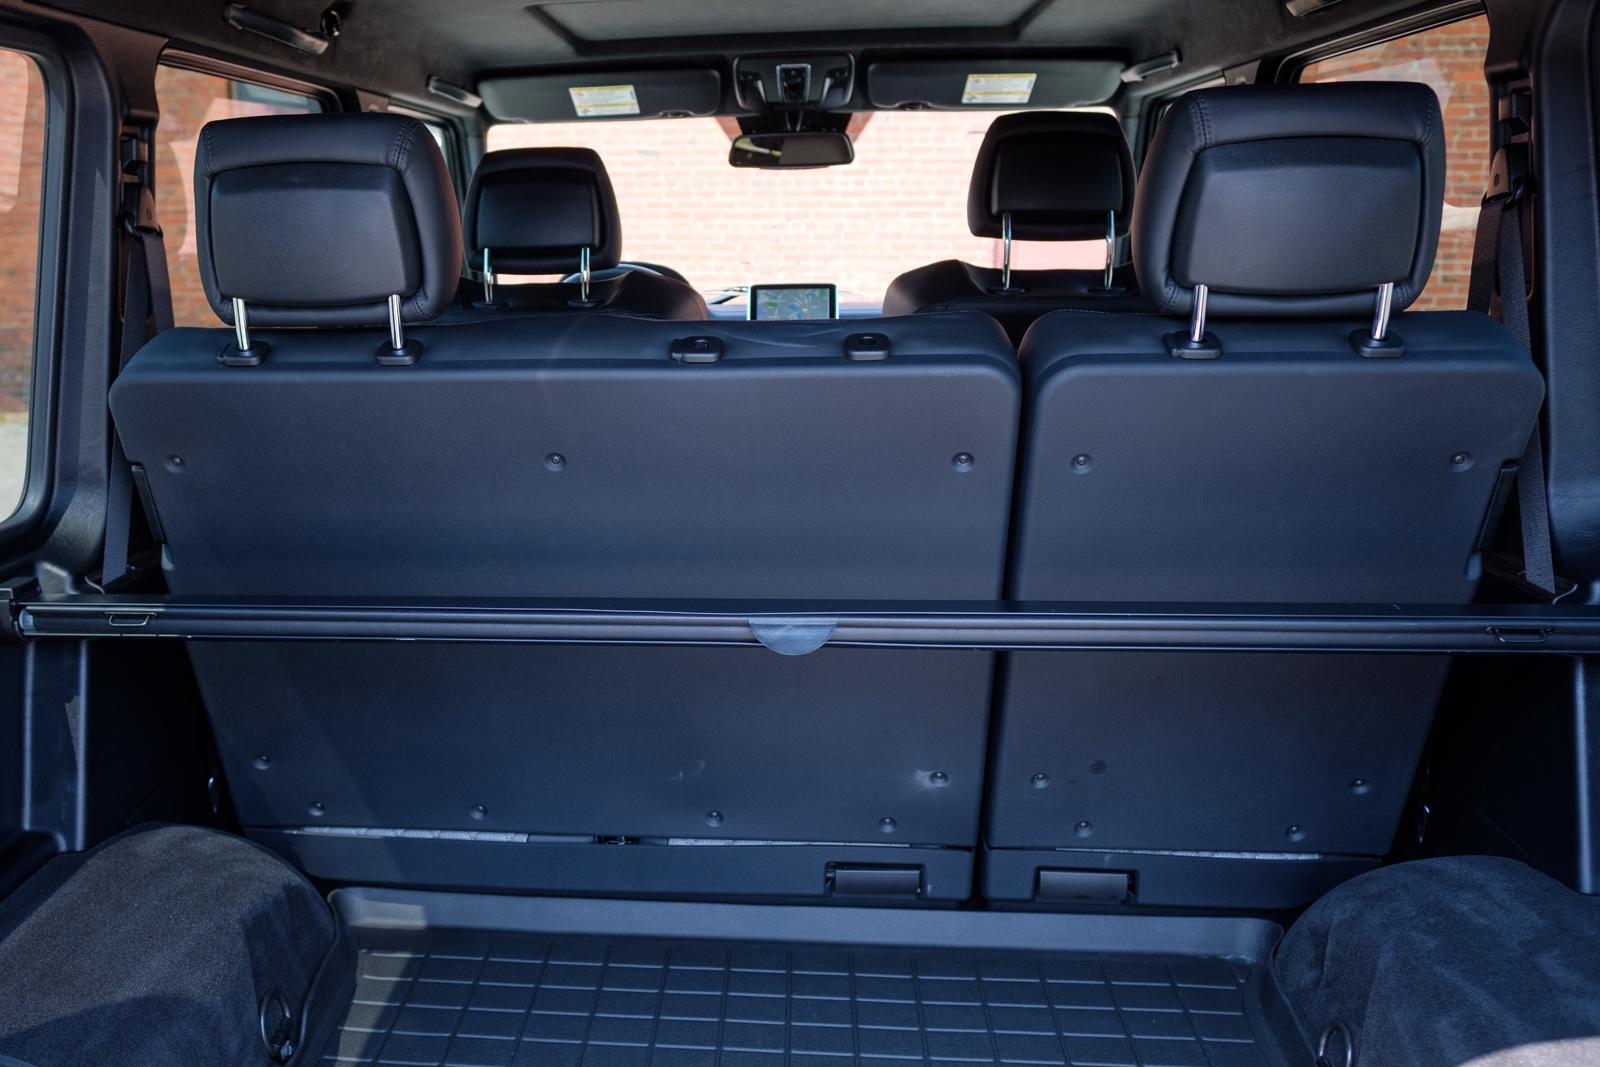 2016 mercedes benz g63 amg 139 silver arrow cars ltd. Black Bedroom Furniture Sets. Home Design Ideas